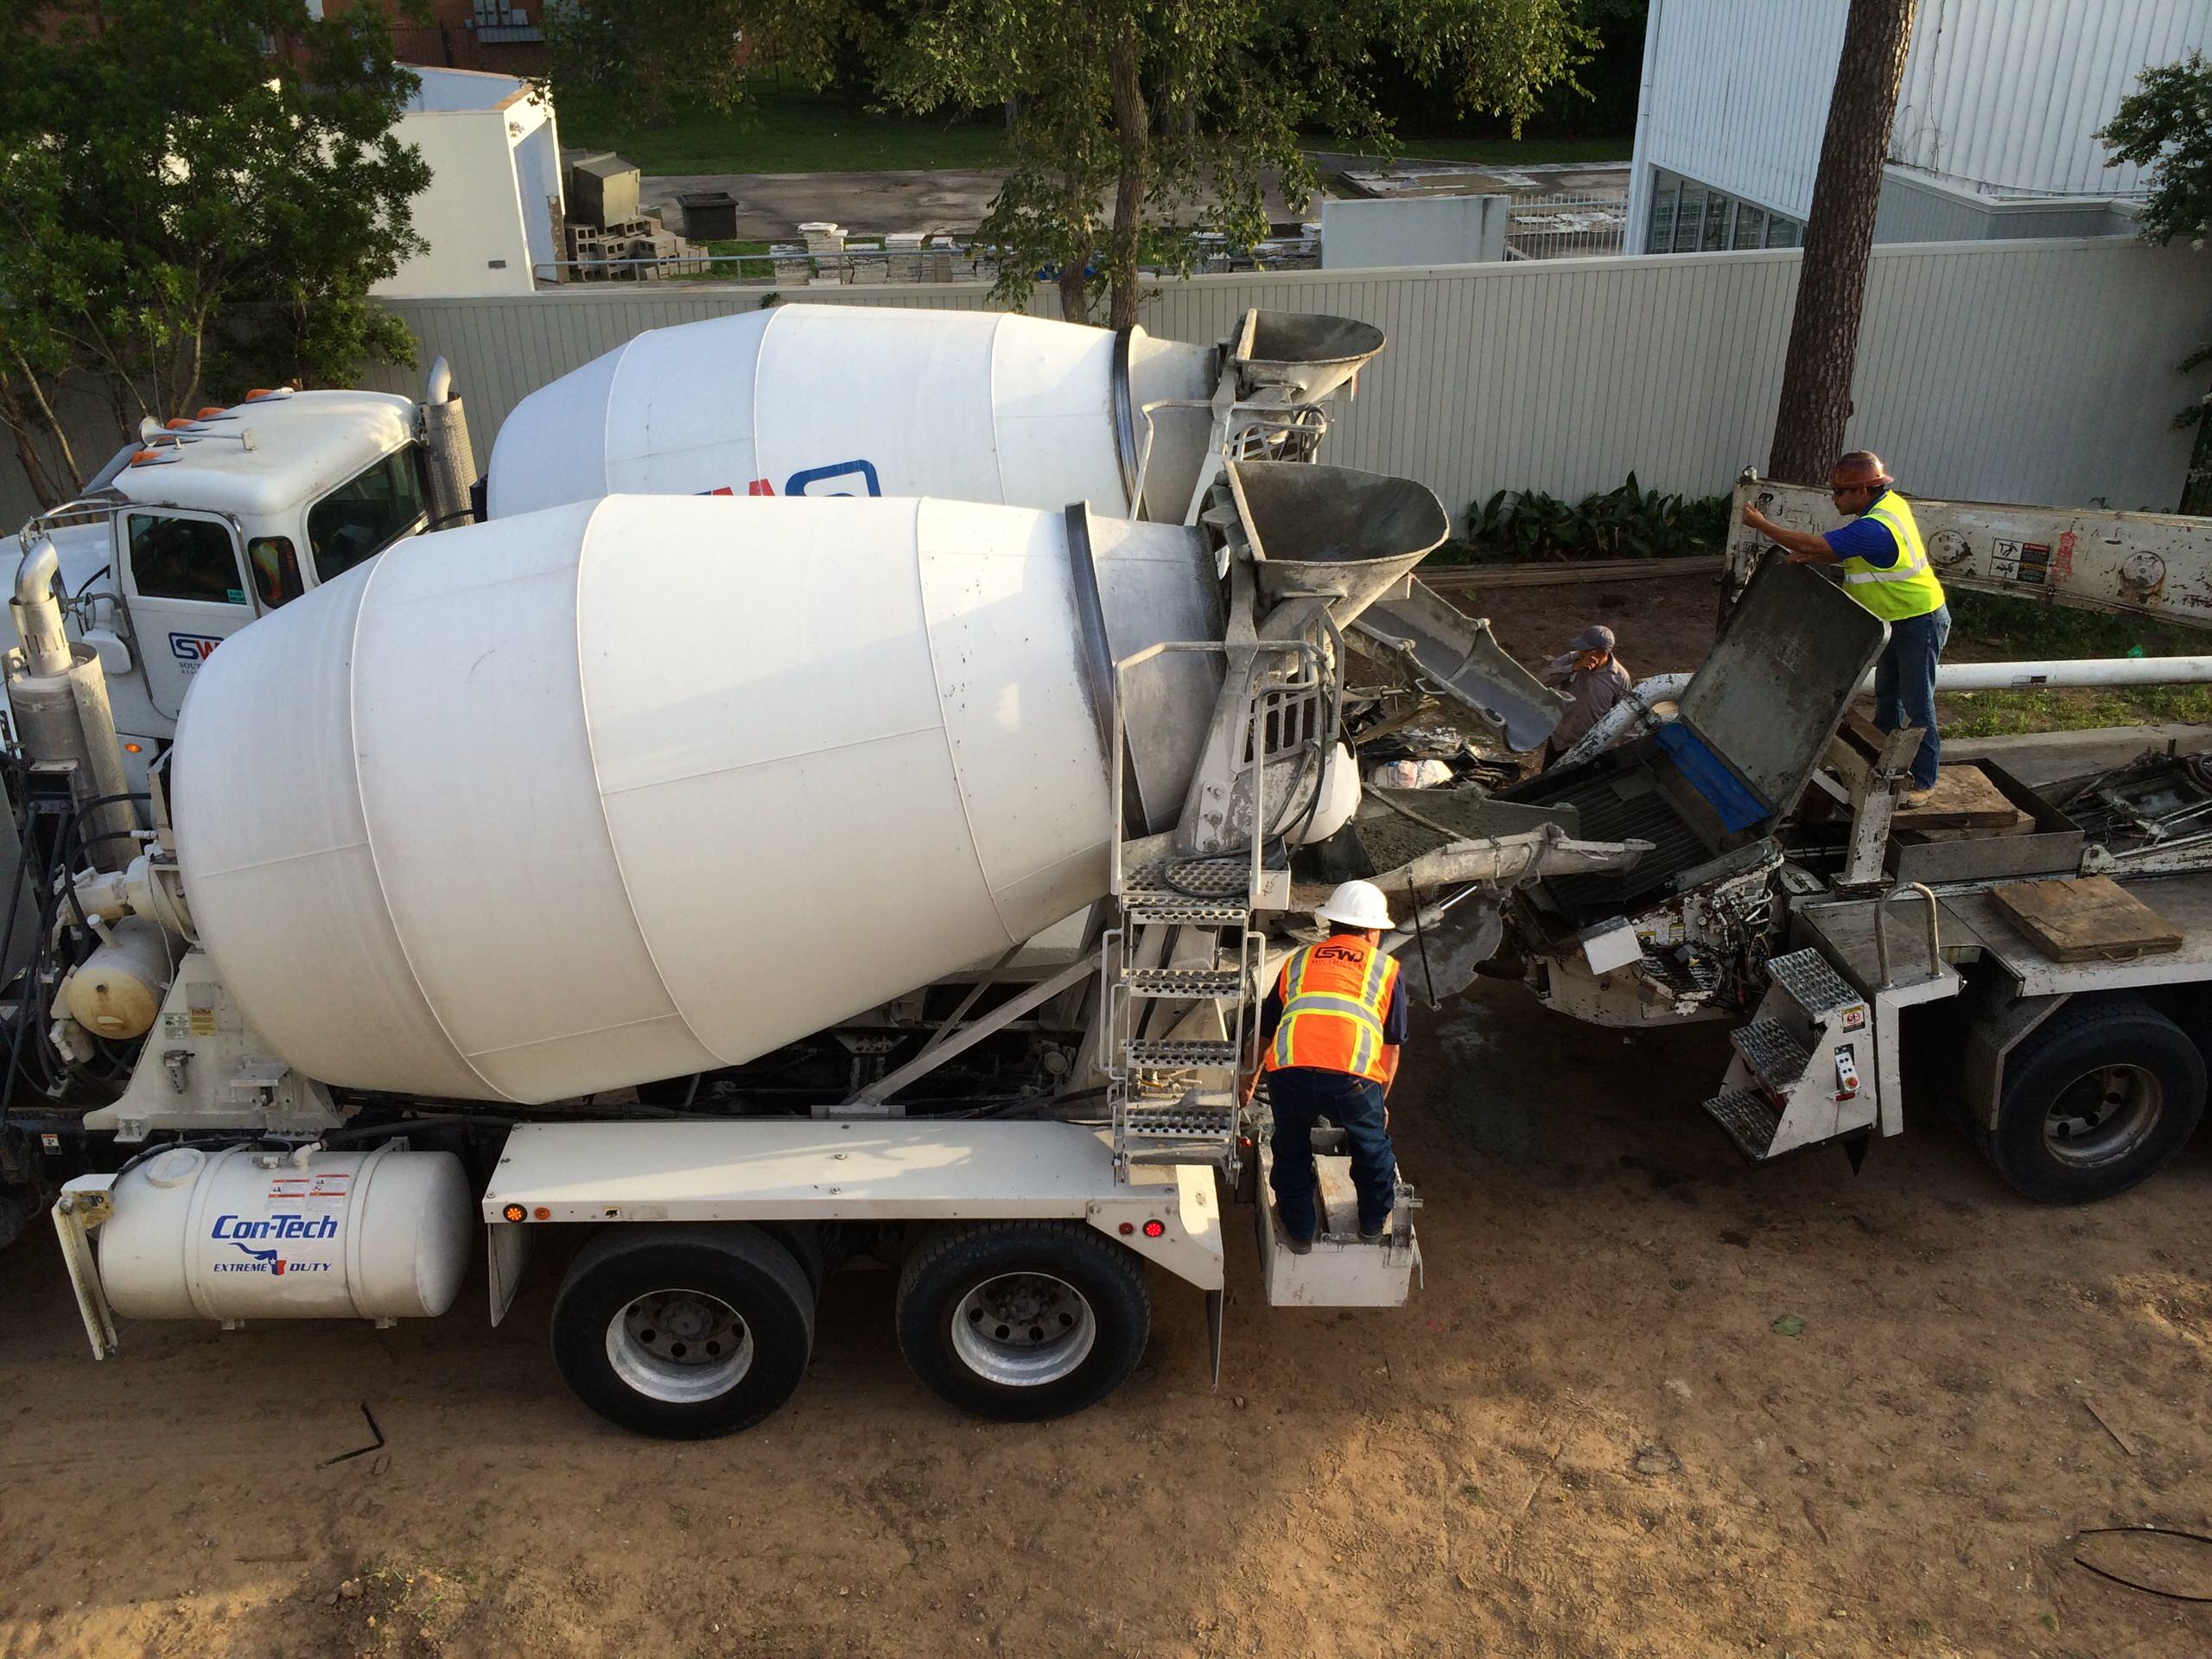 Double duty concrete trucks